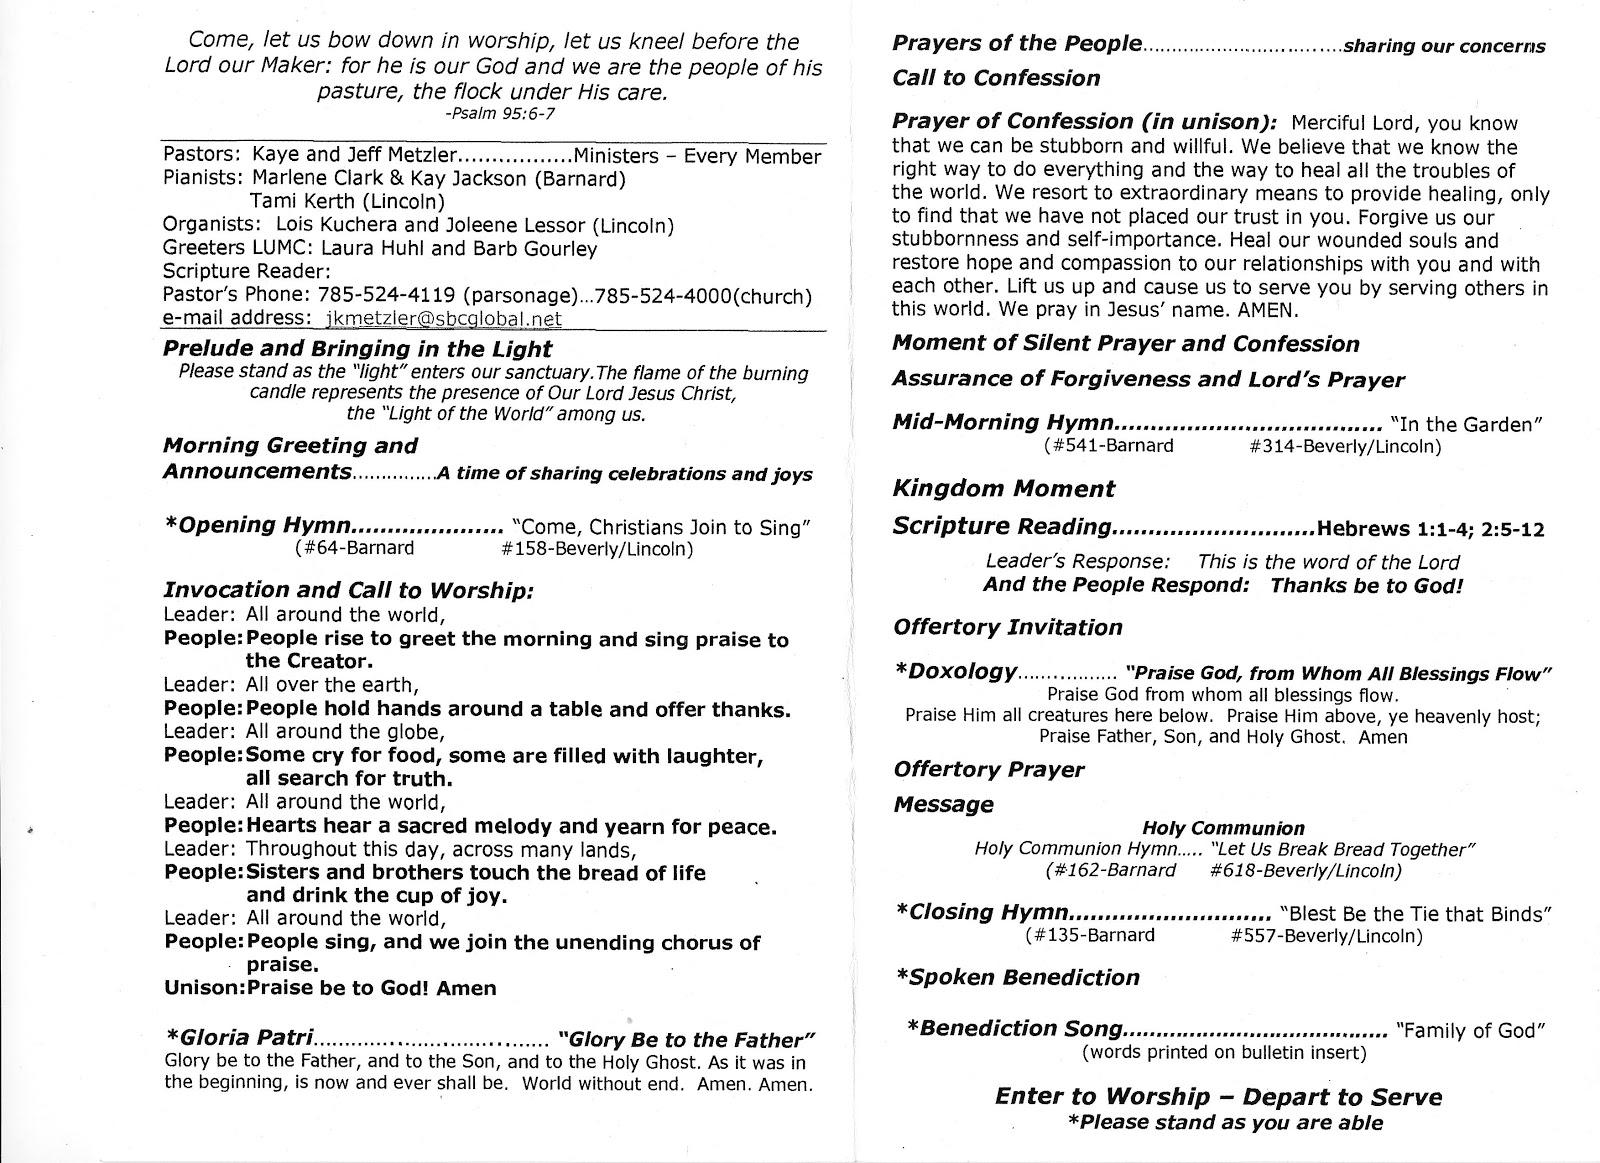 Barnard Banter: Barnard United Methodist Church World Communion